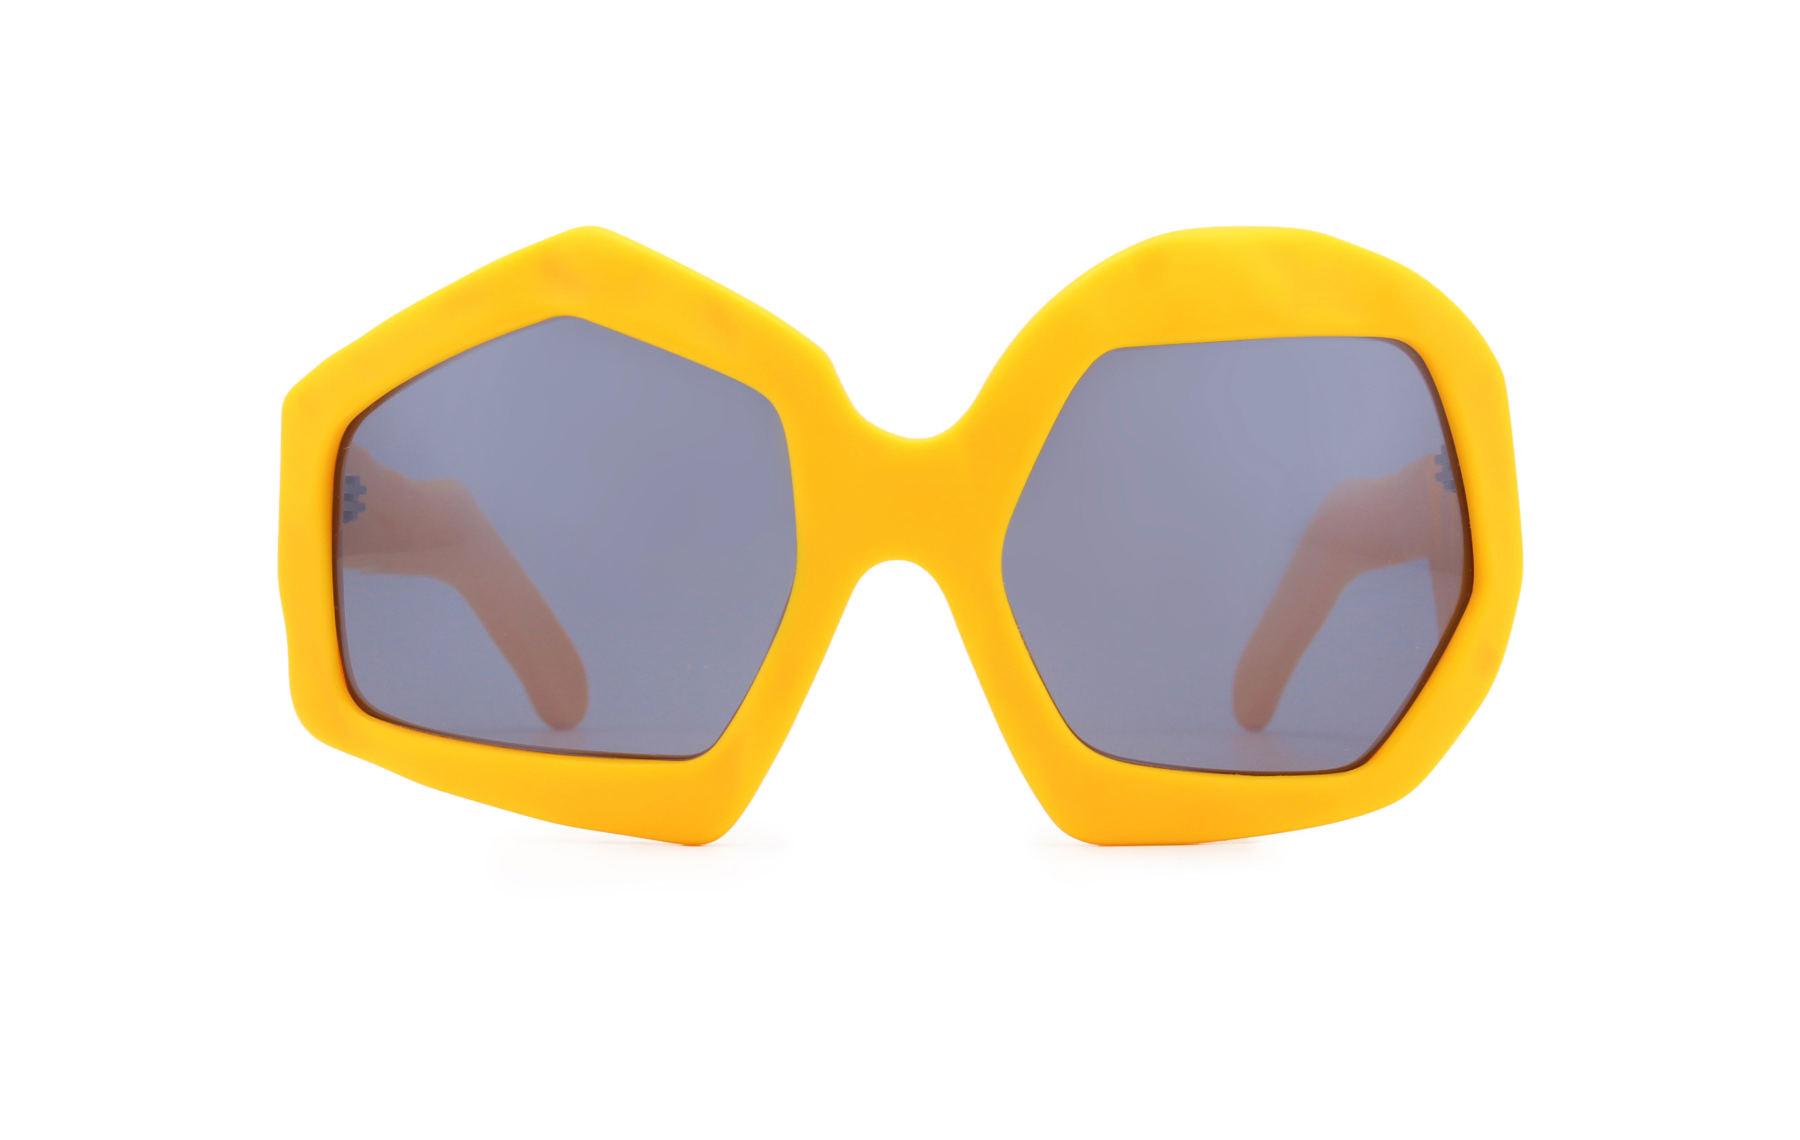 FAKBYFAK x Walter Van Beirendonck  Thunder Sunglasses. Zinnia Orange Code: FBF-09-12-06